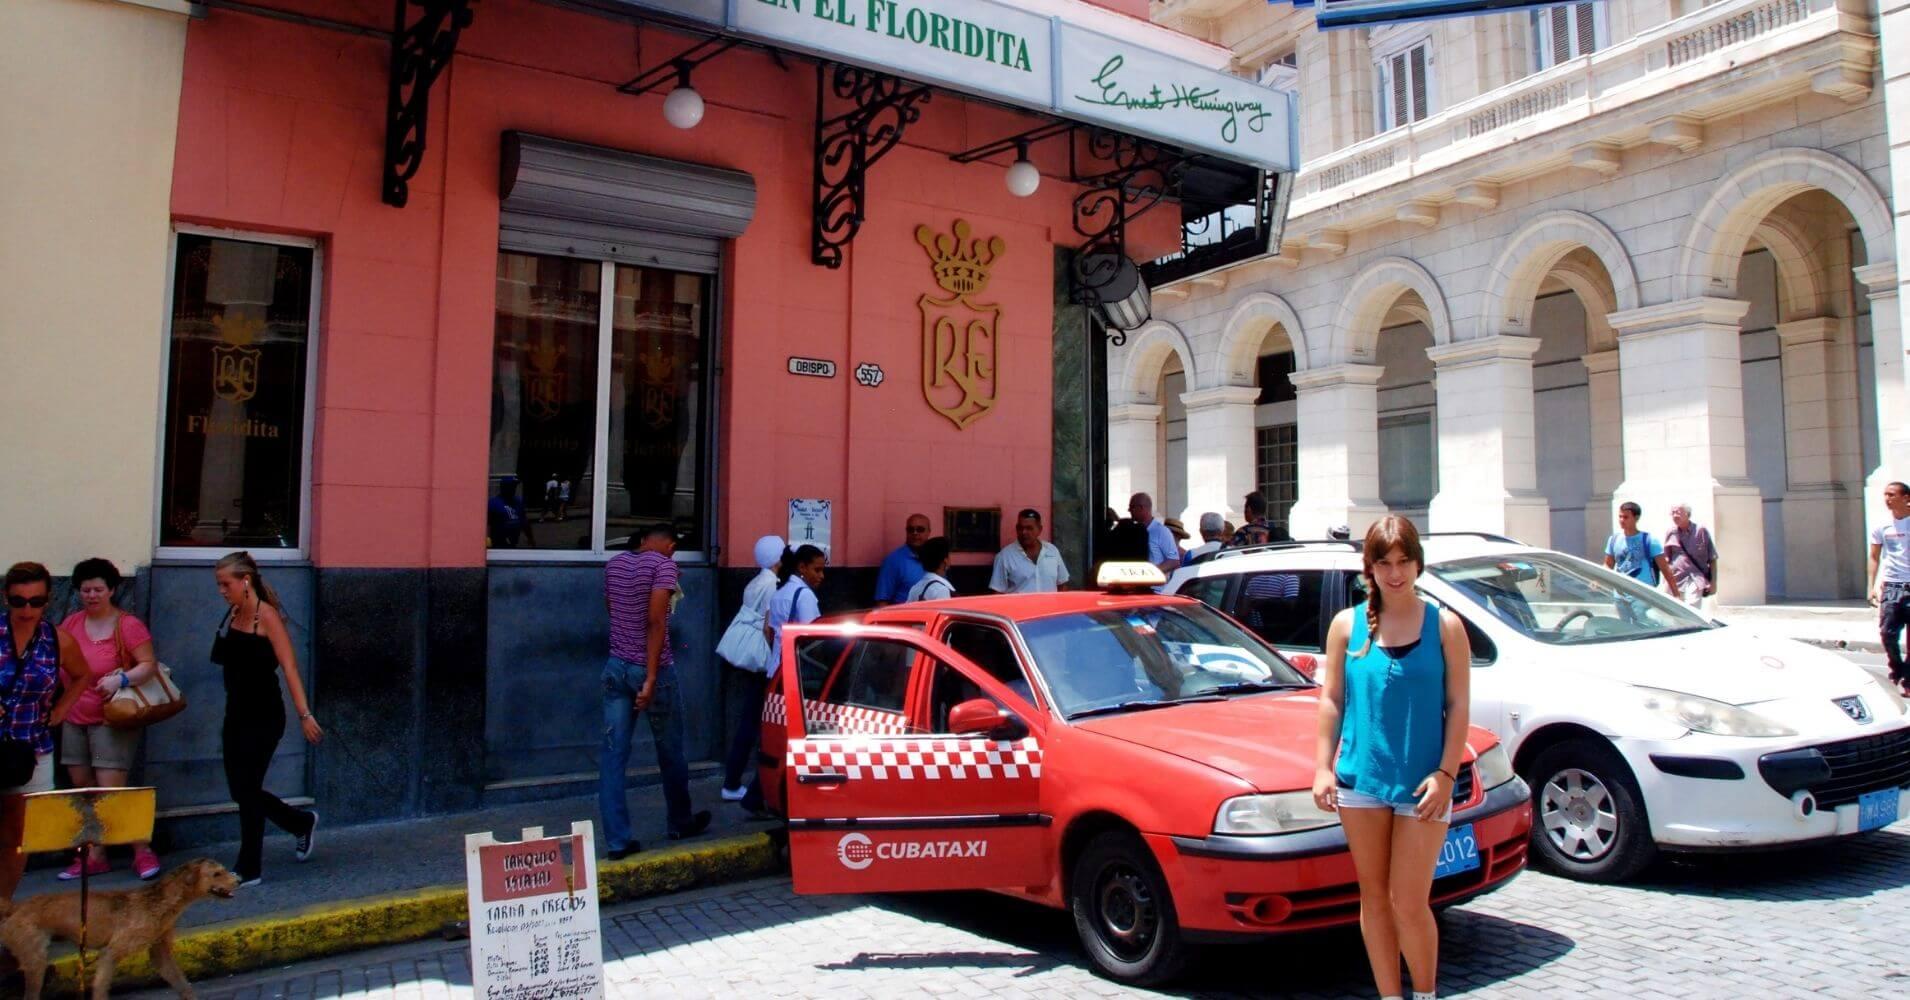 Entrada de La Floridita en La Habana, Cuba.